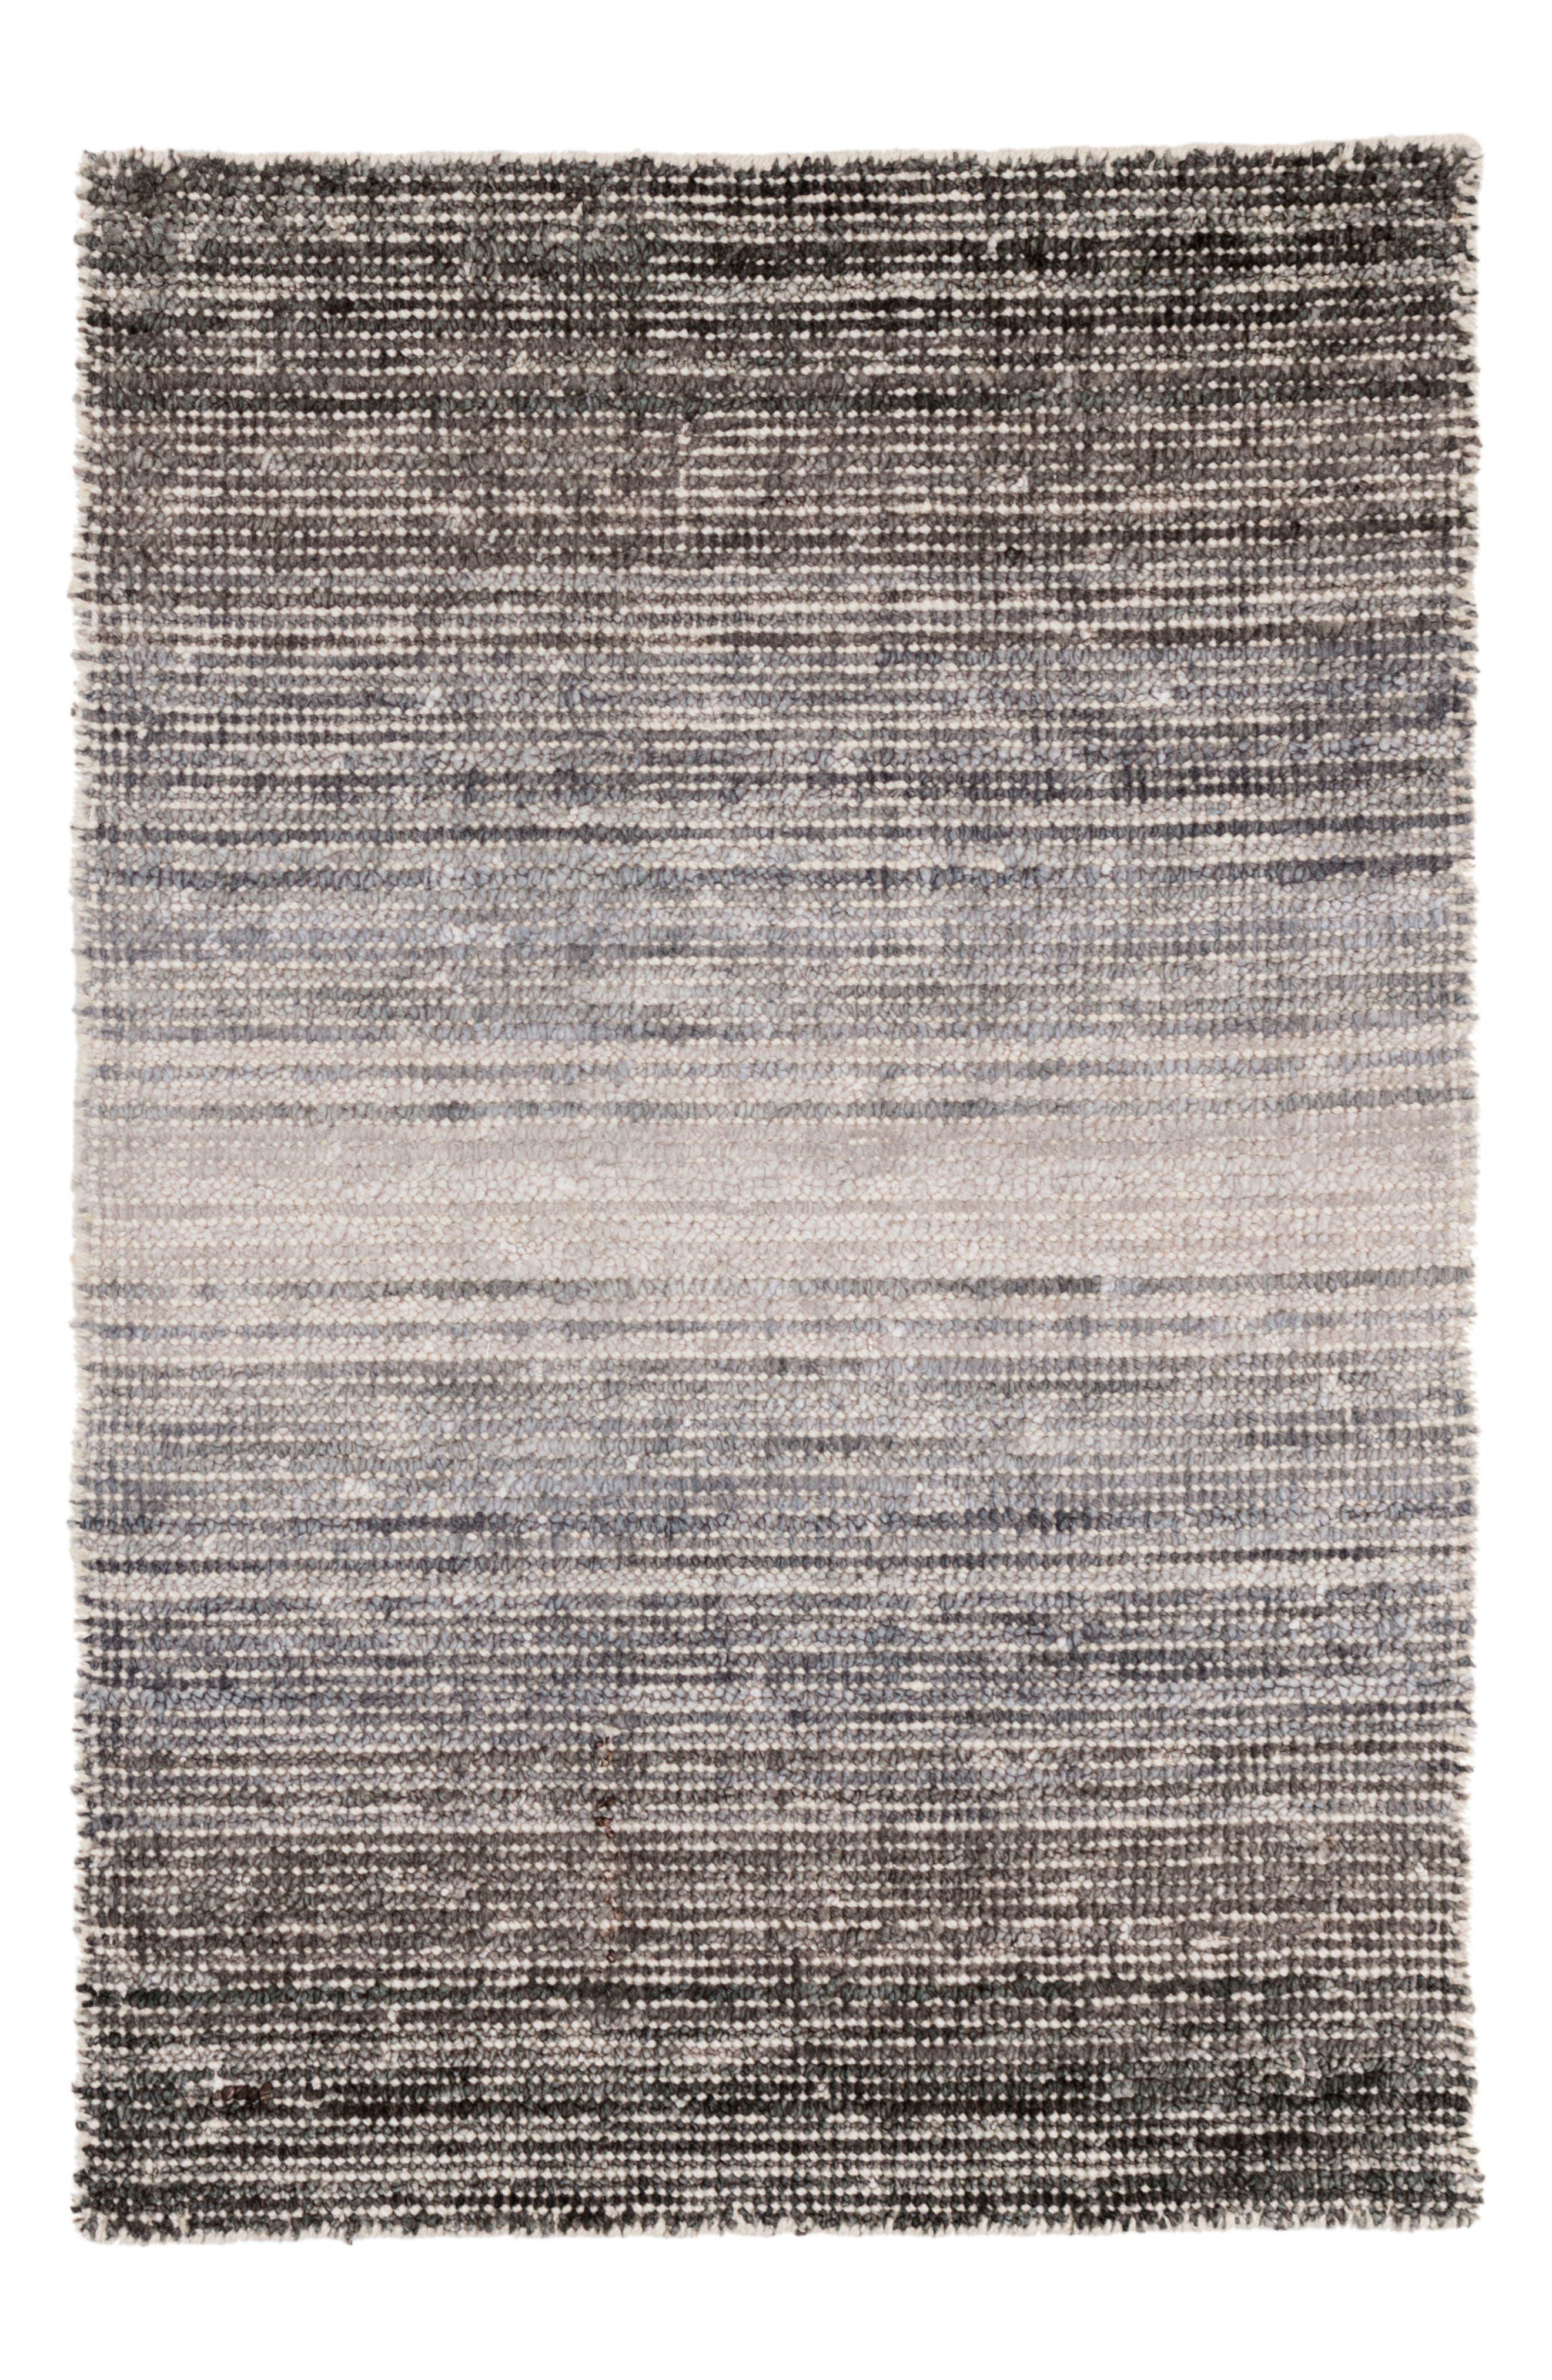 Grey Moon Handwoven Rug,                             Main thumbnail 1, color,                             Grey